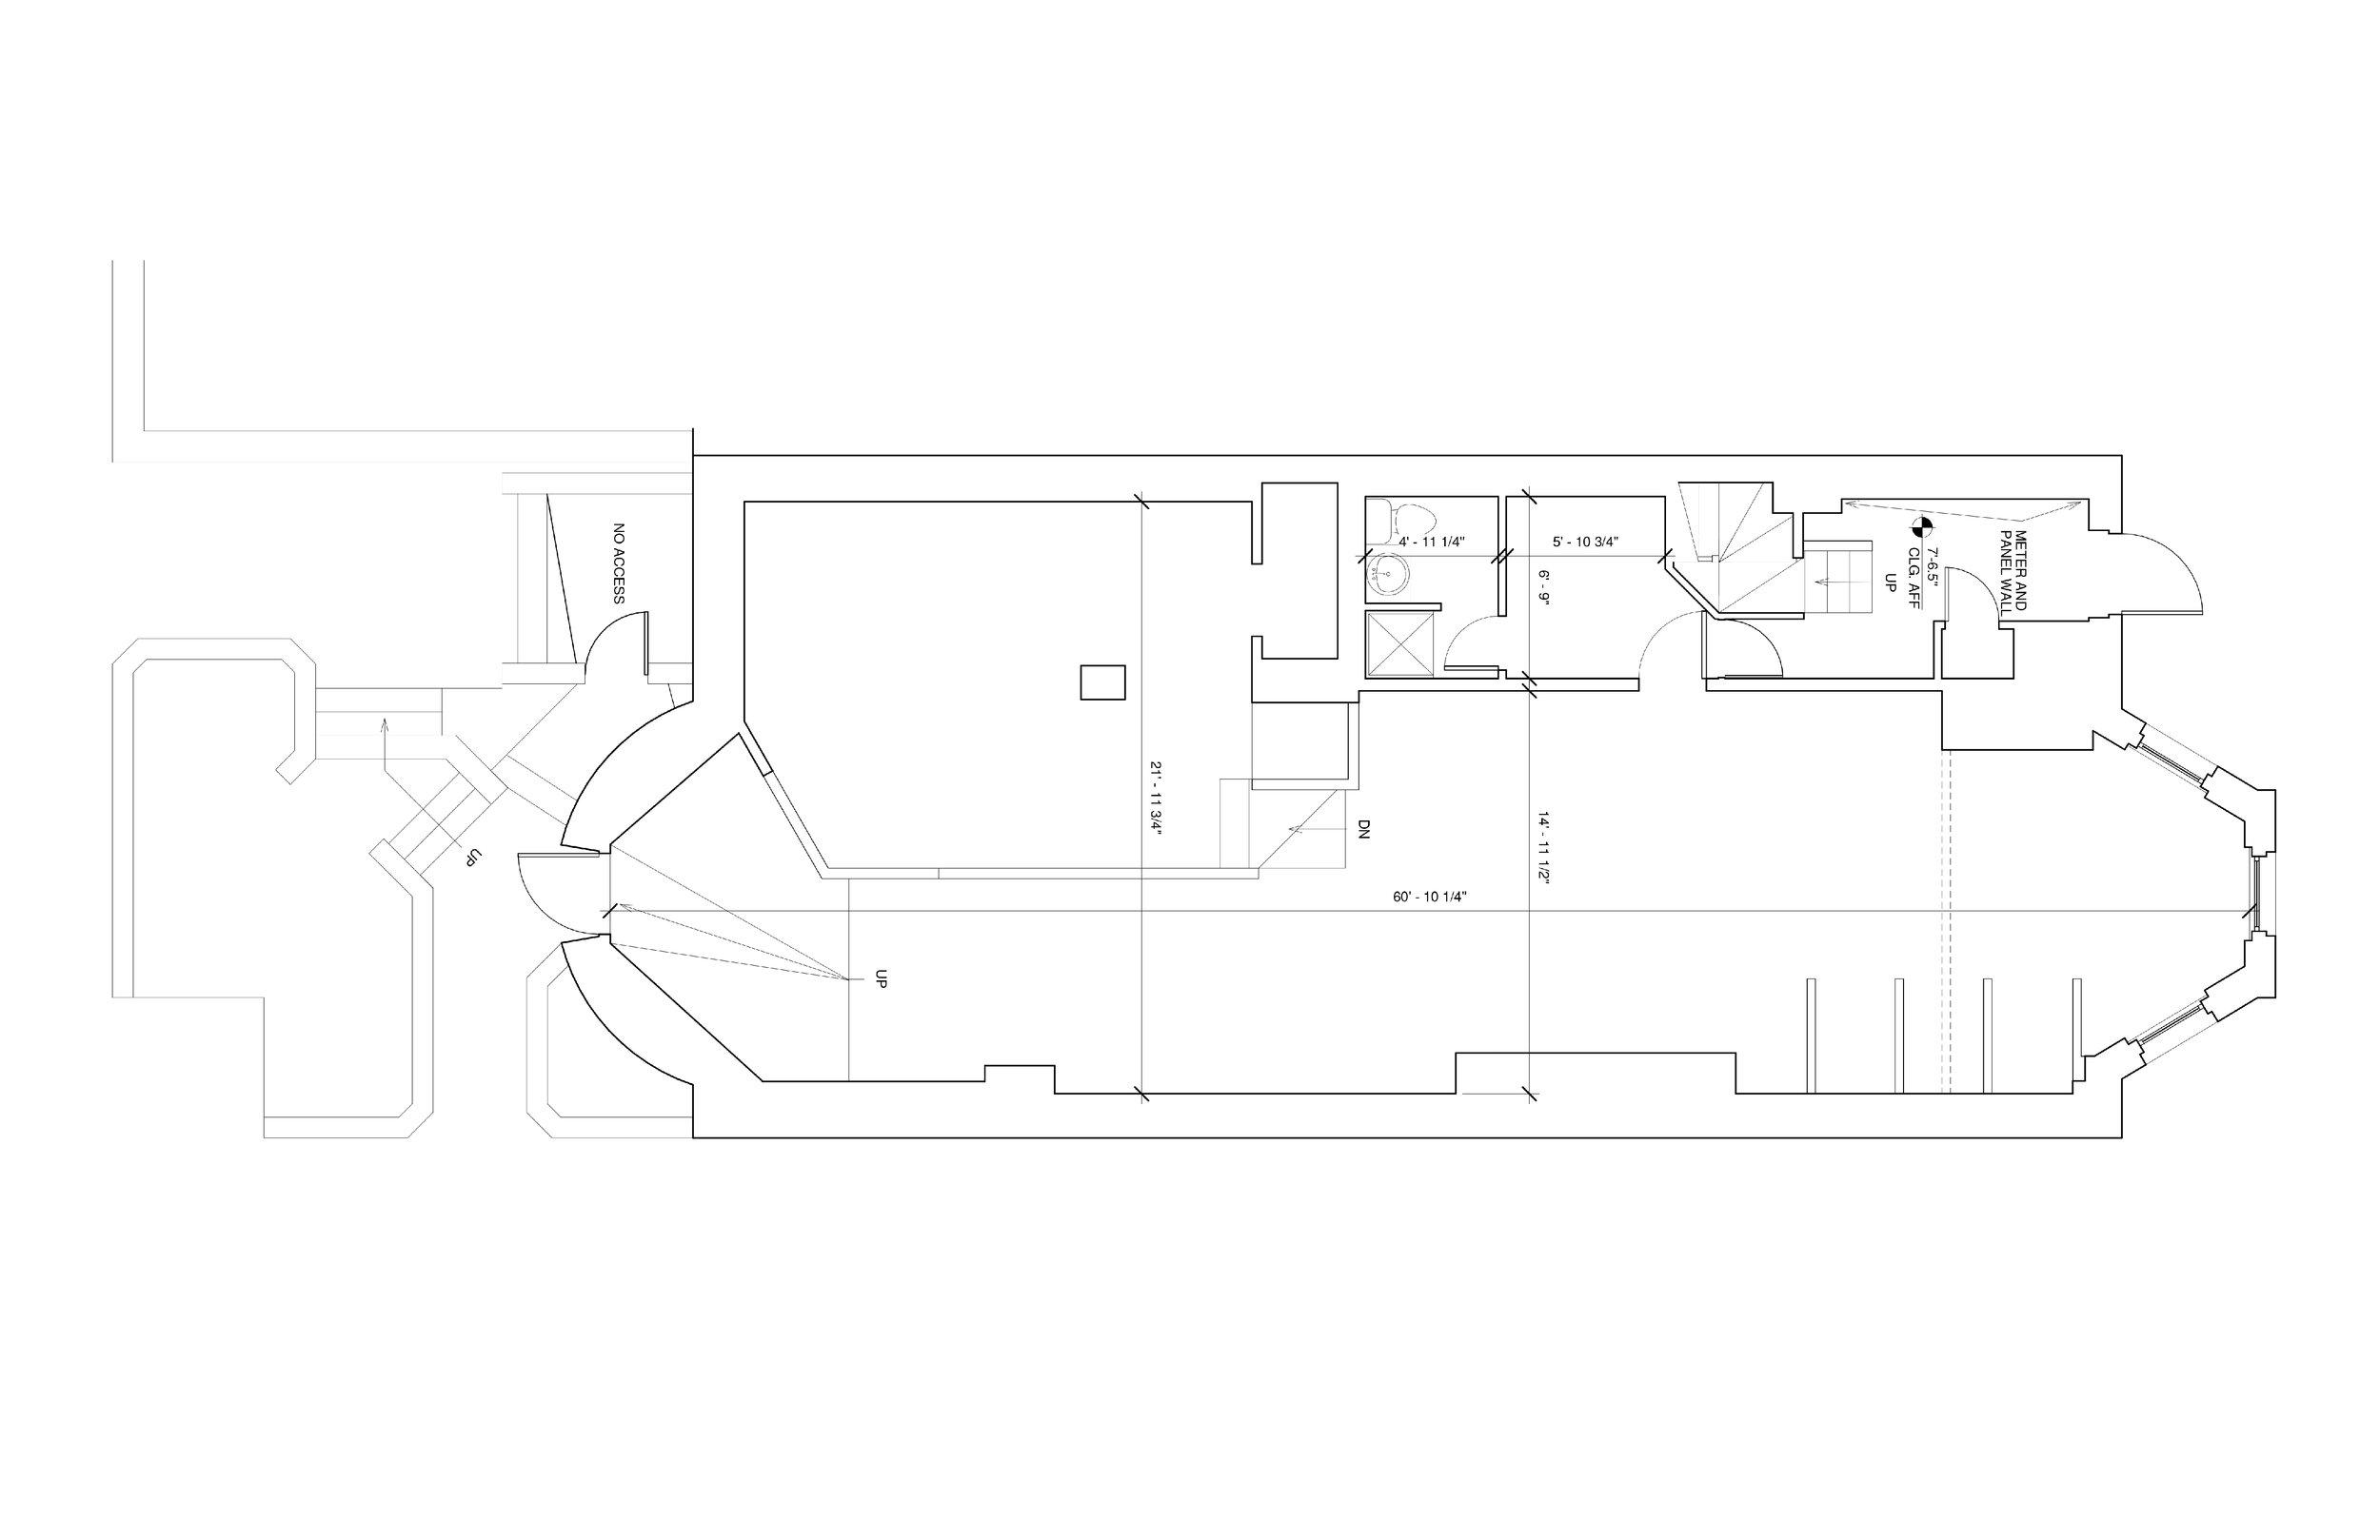 175NewburySt-WalkDown-01.jpg